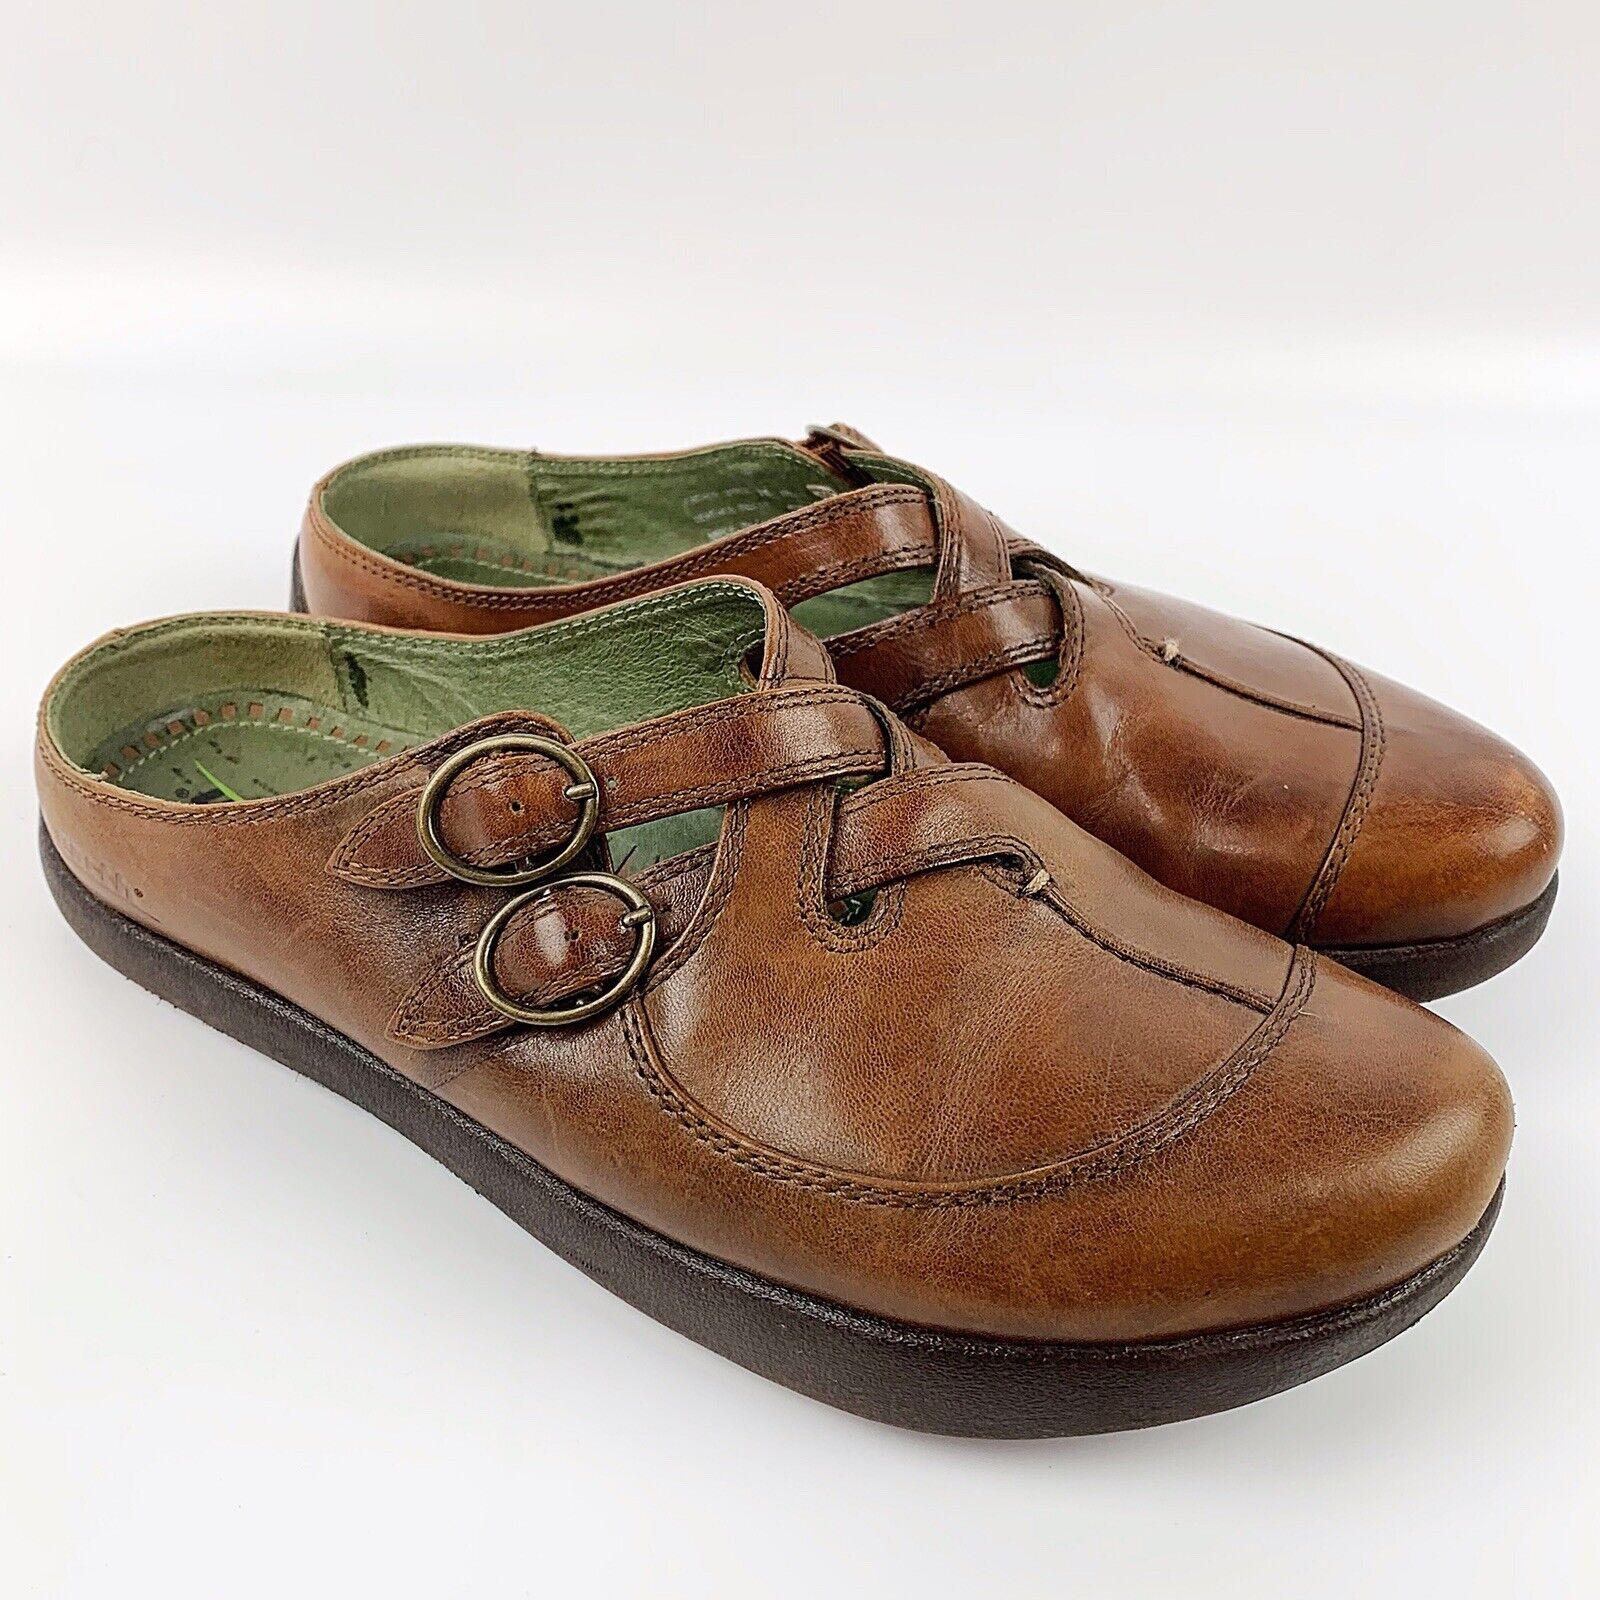 EARTH KLASO Womens Faithe Brown Leather Slip On Clog Mules Comfort shoes Sz 7